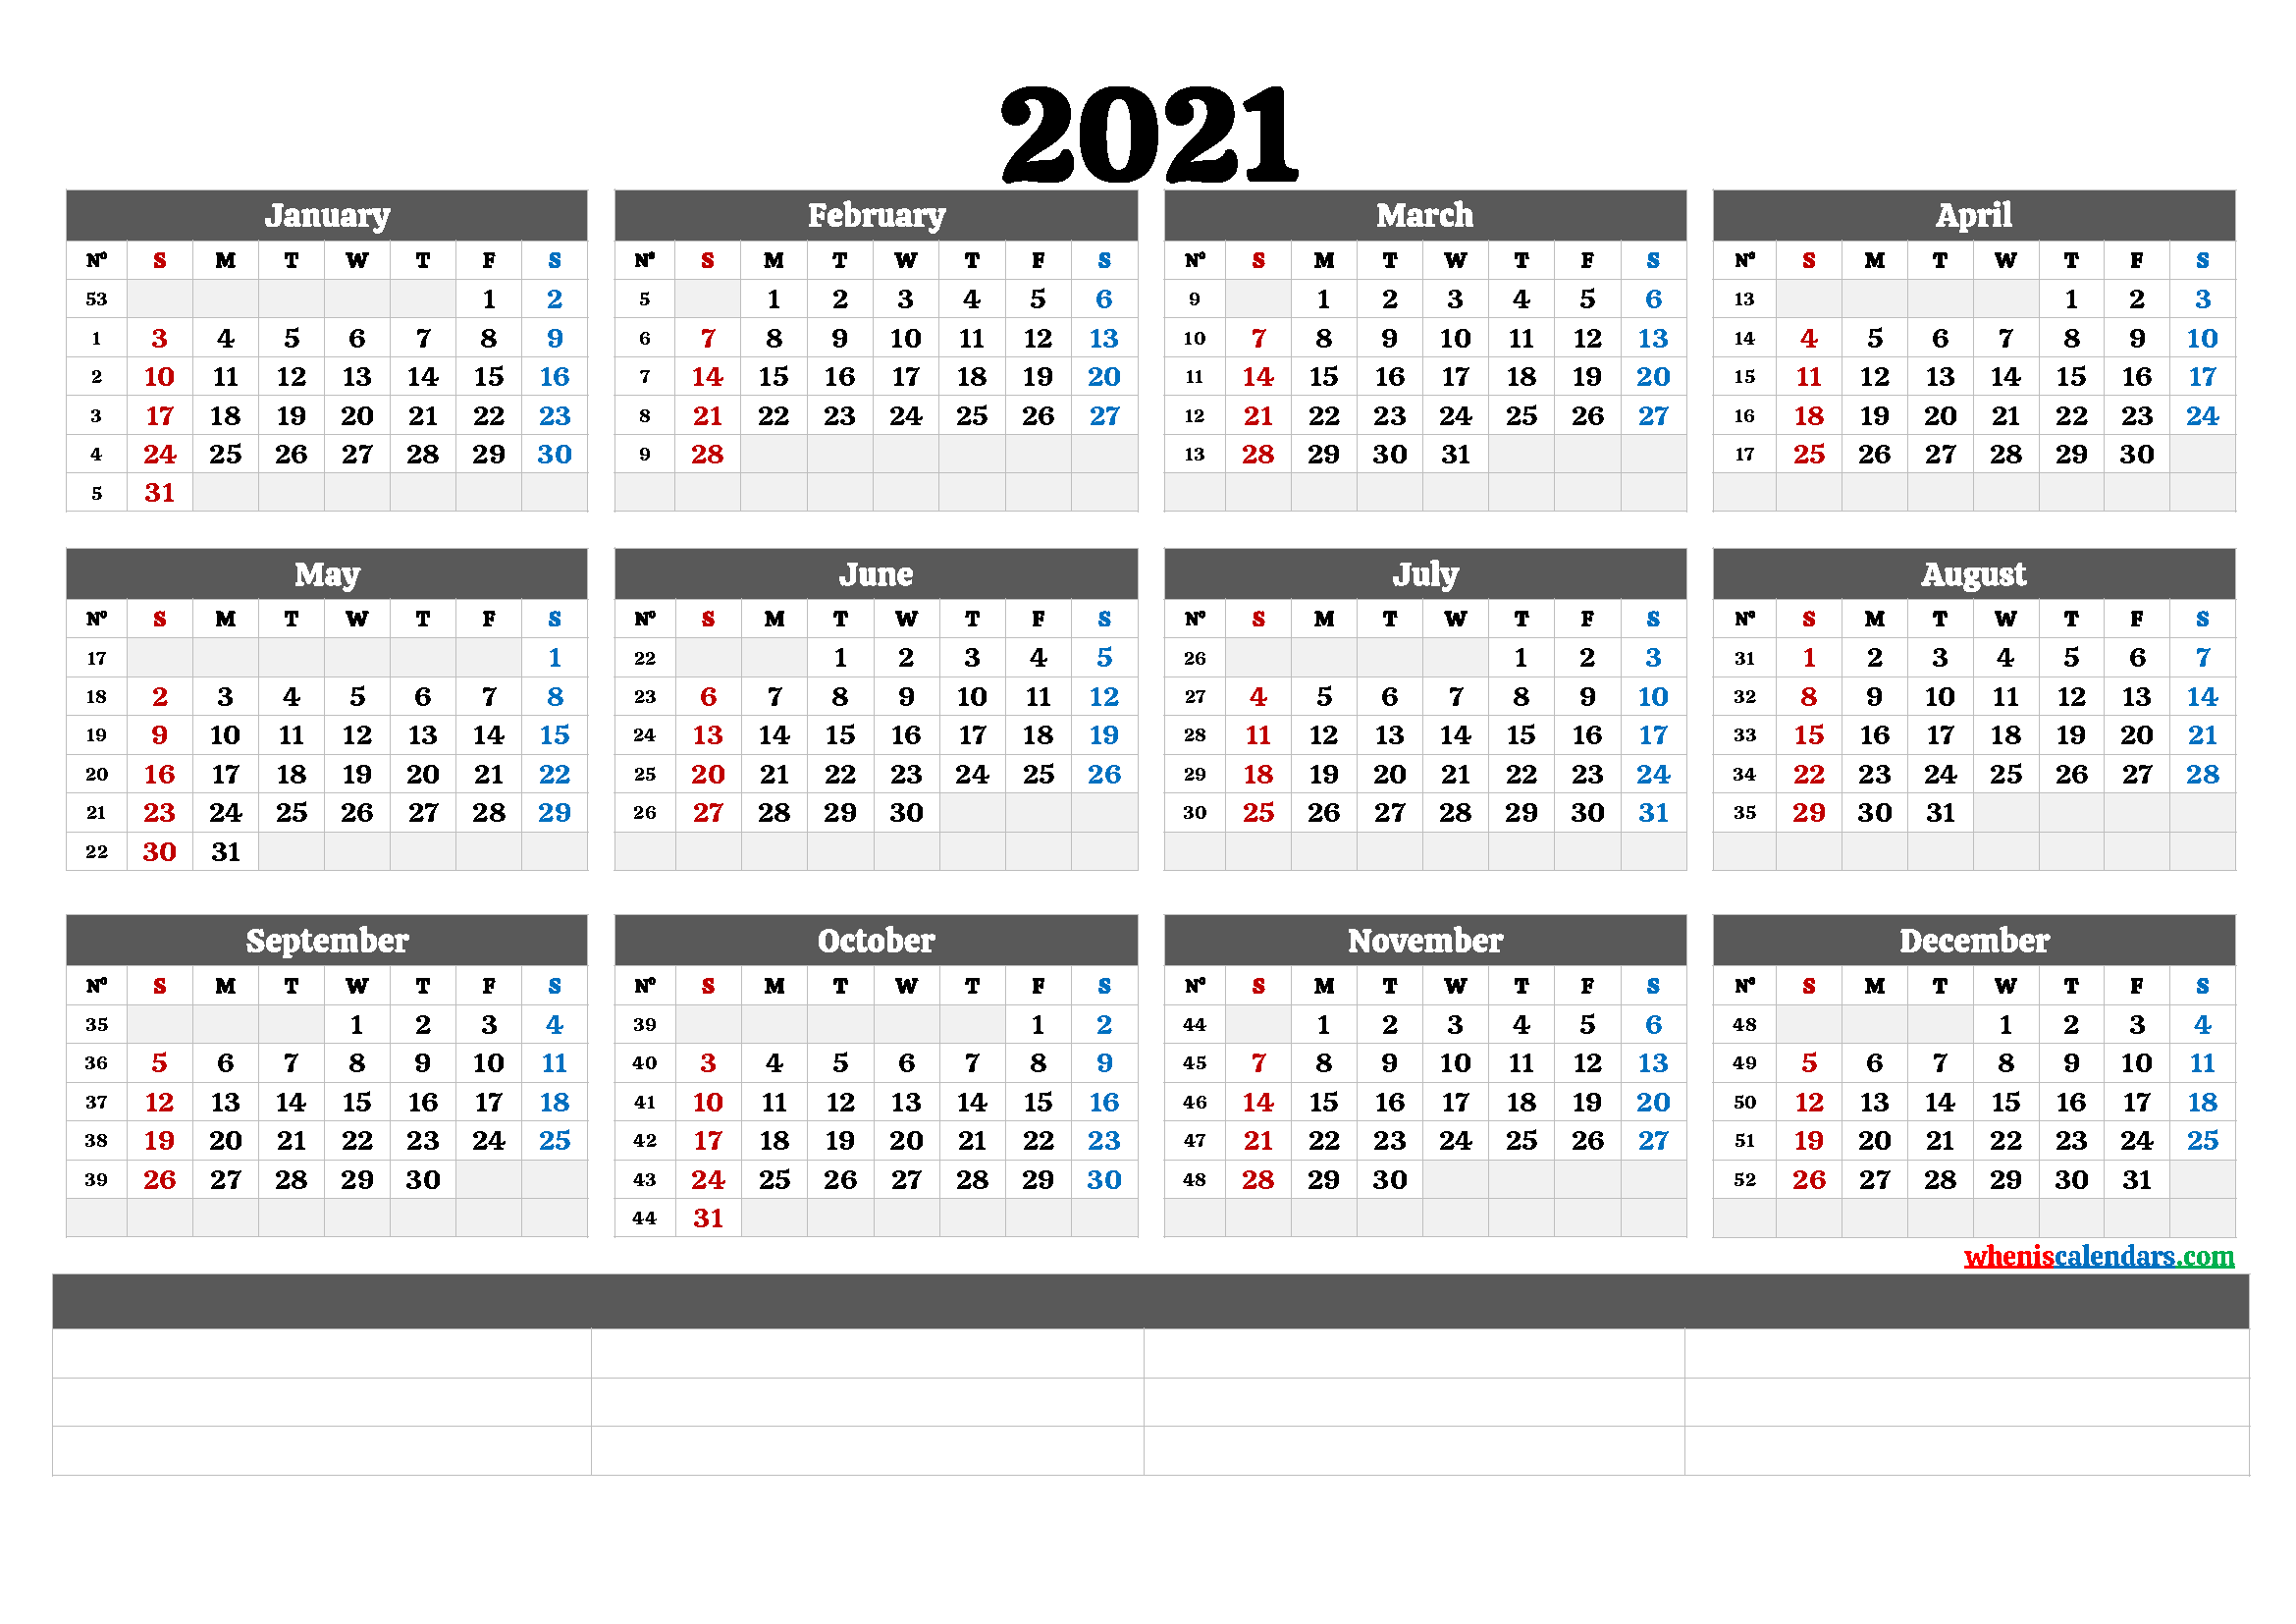 2021 Annual Calendar Printable (6 Templates) | Free ...